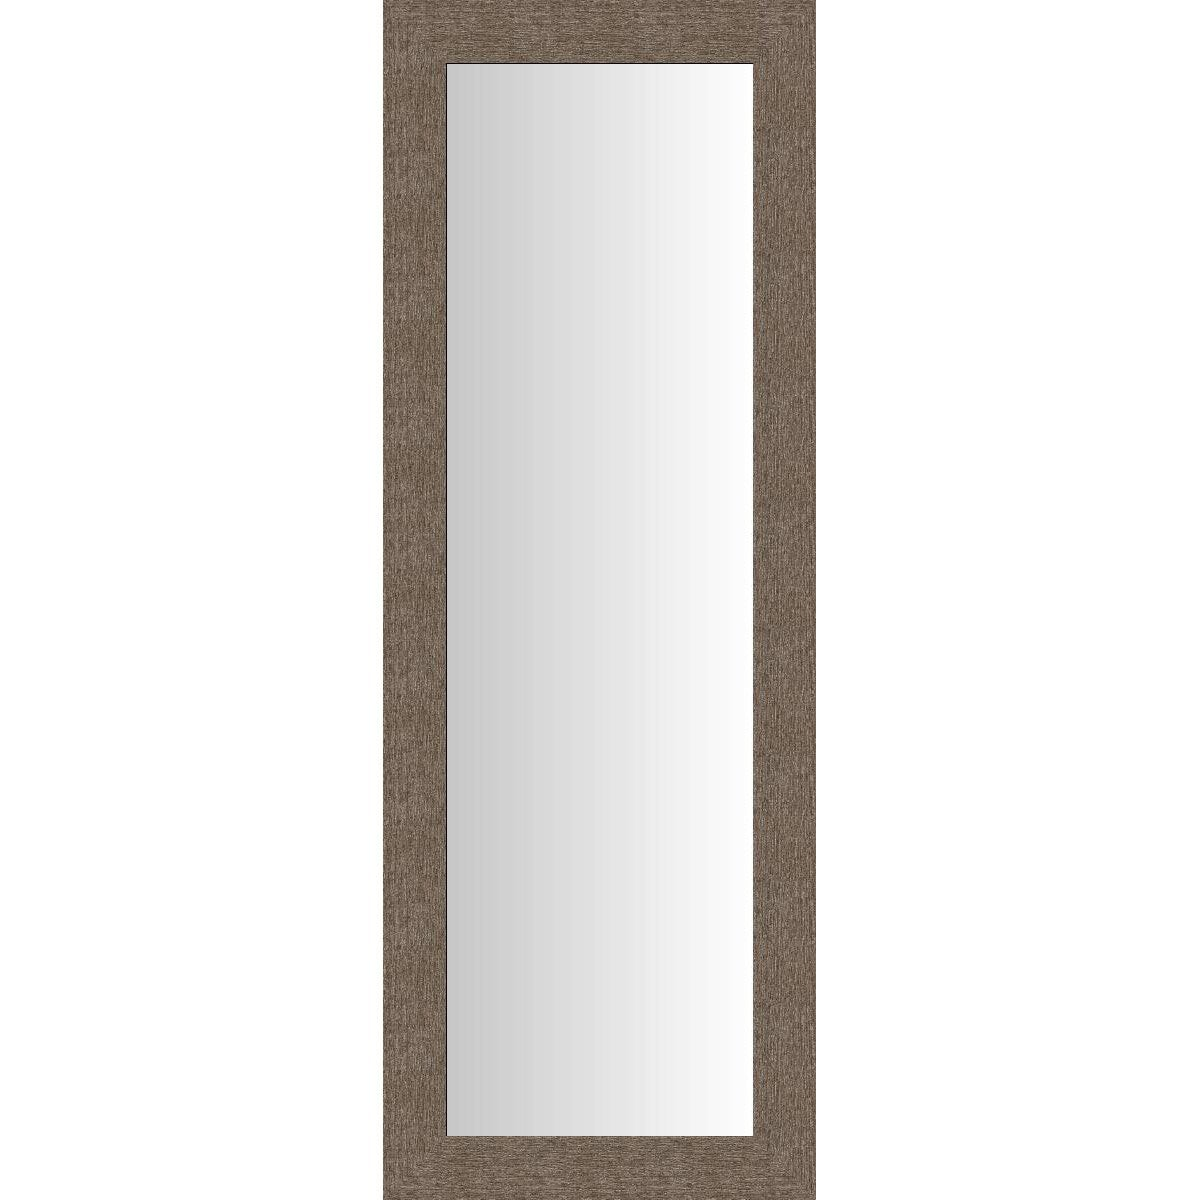 Miroir dublin brun 40x140 cm leroy merlin for Miroir 140 x 60